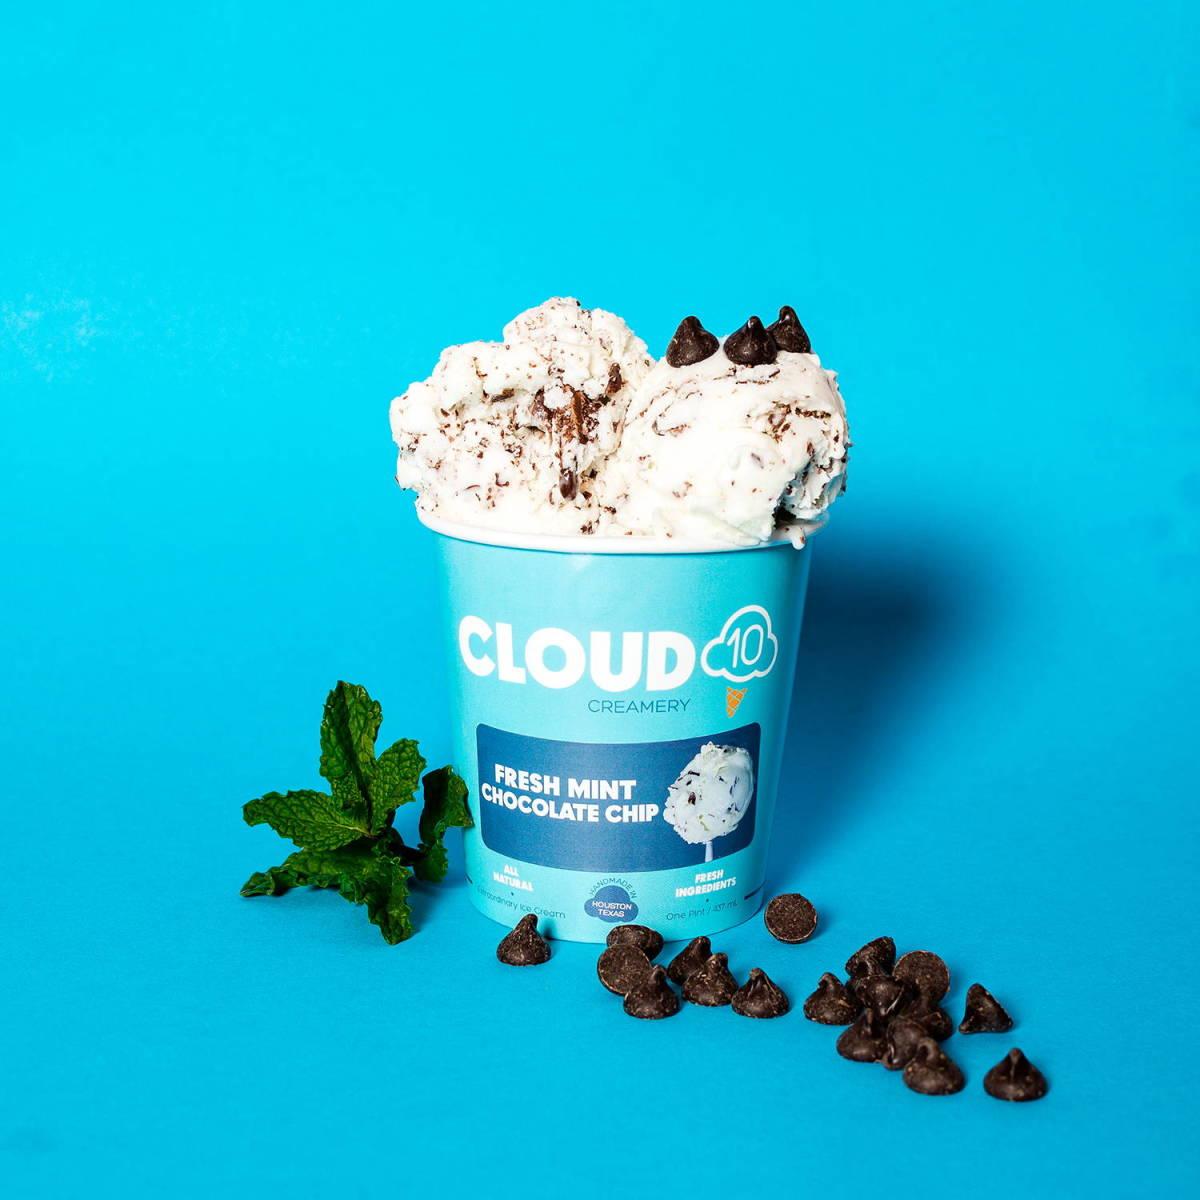 Cloud 10 Creamery fresh mint pint